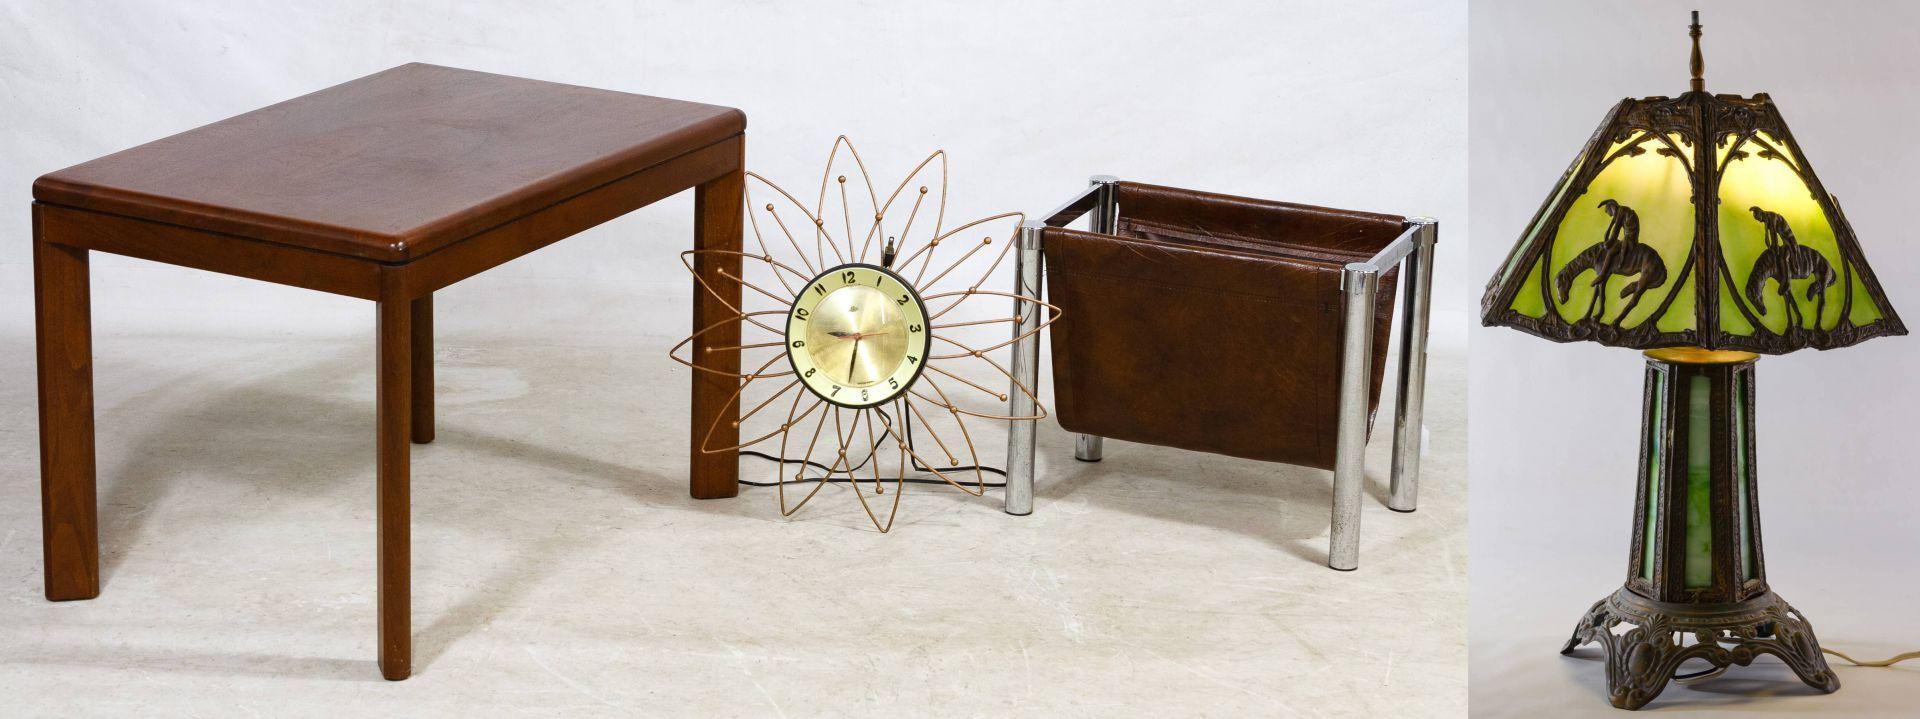 Lot 513: Mid-Century Modern Style Teak Table by Steelcase